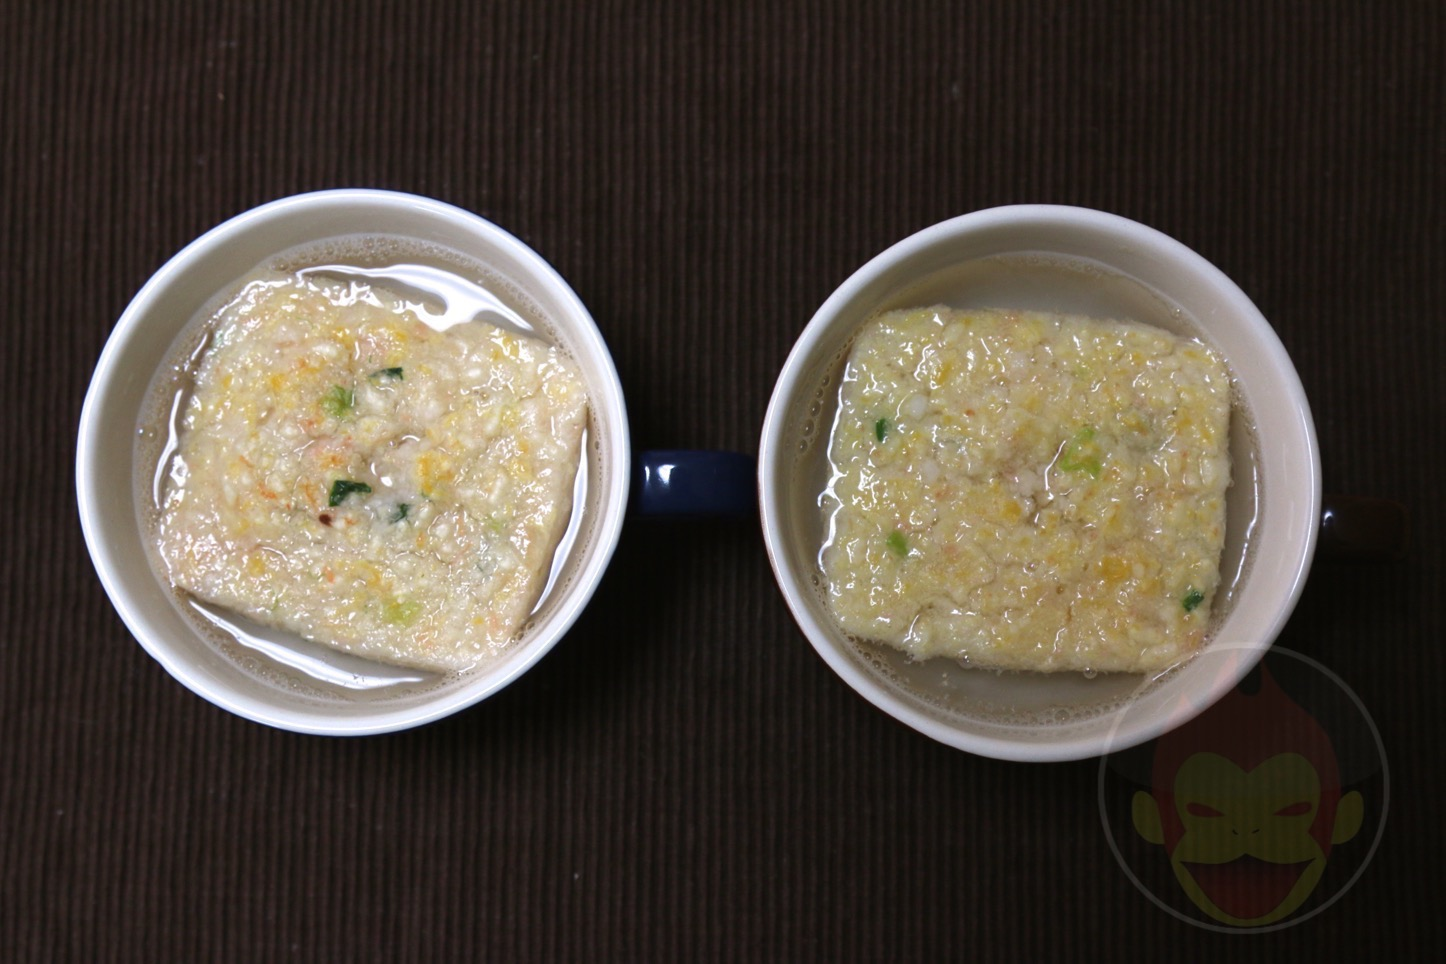 Amano-Foods-13.jpg